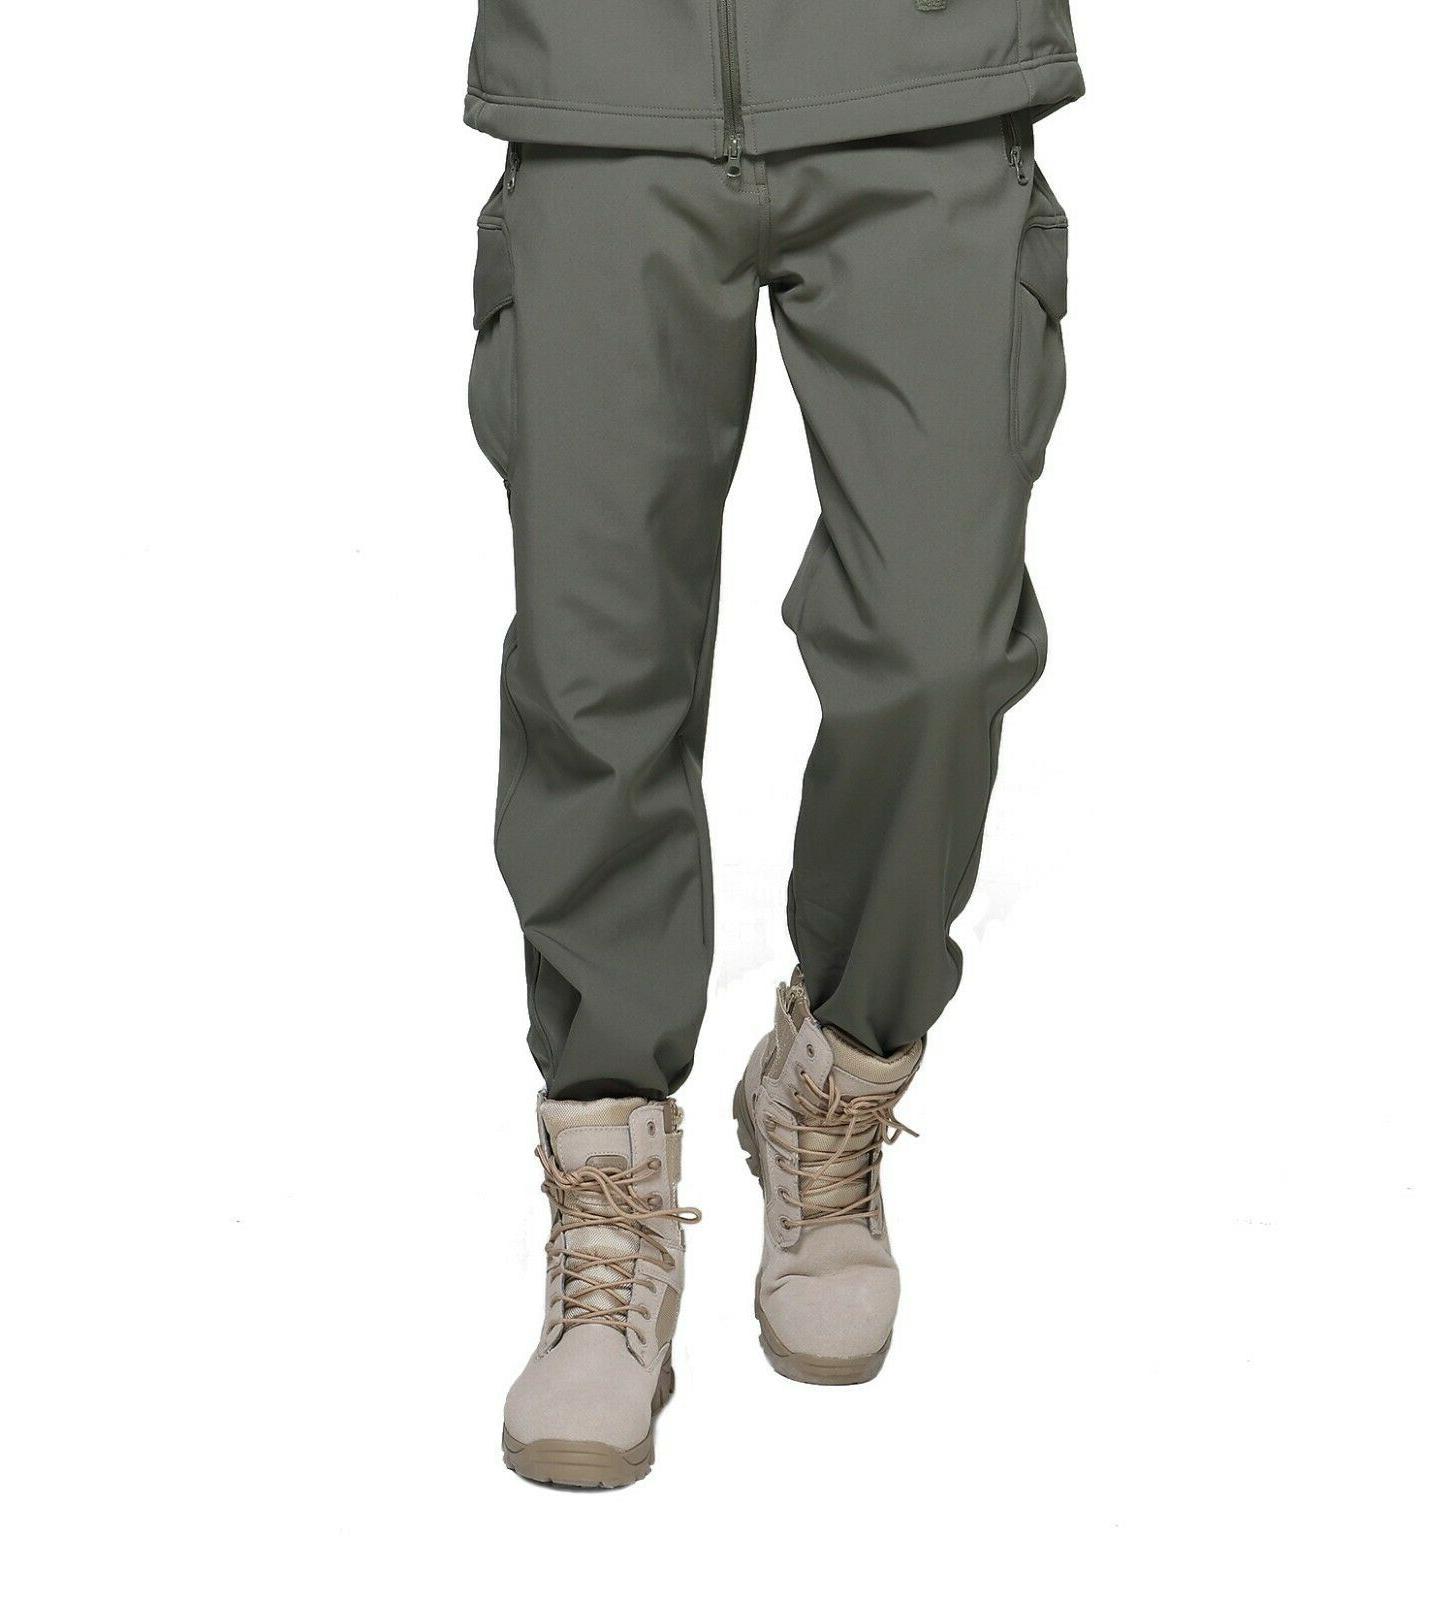 Fleece Hunting Pant Trousers